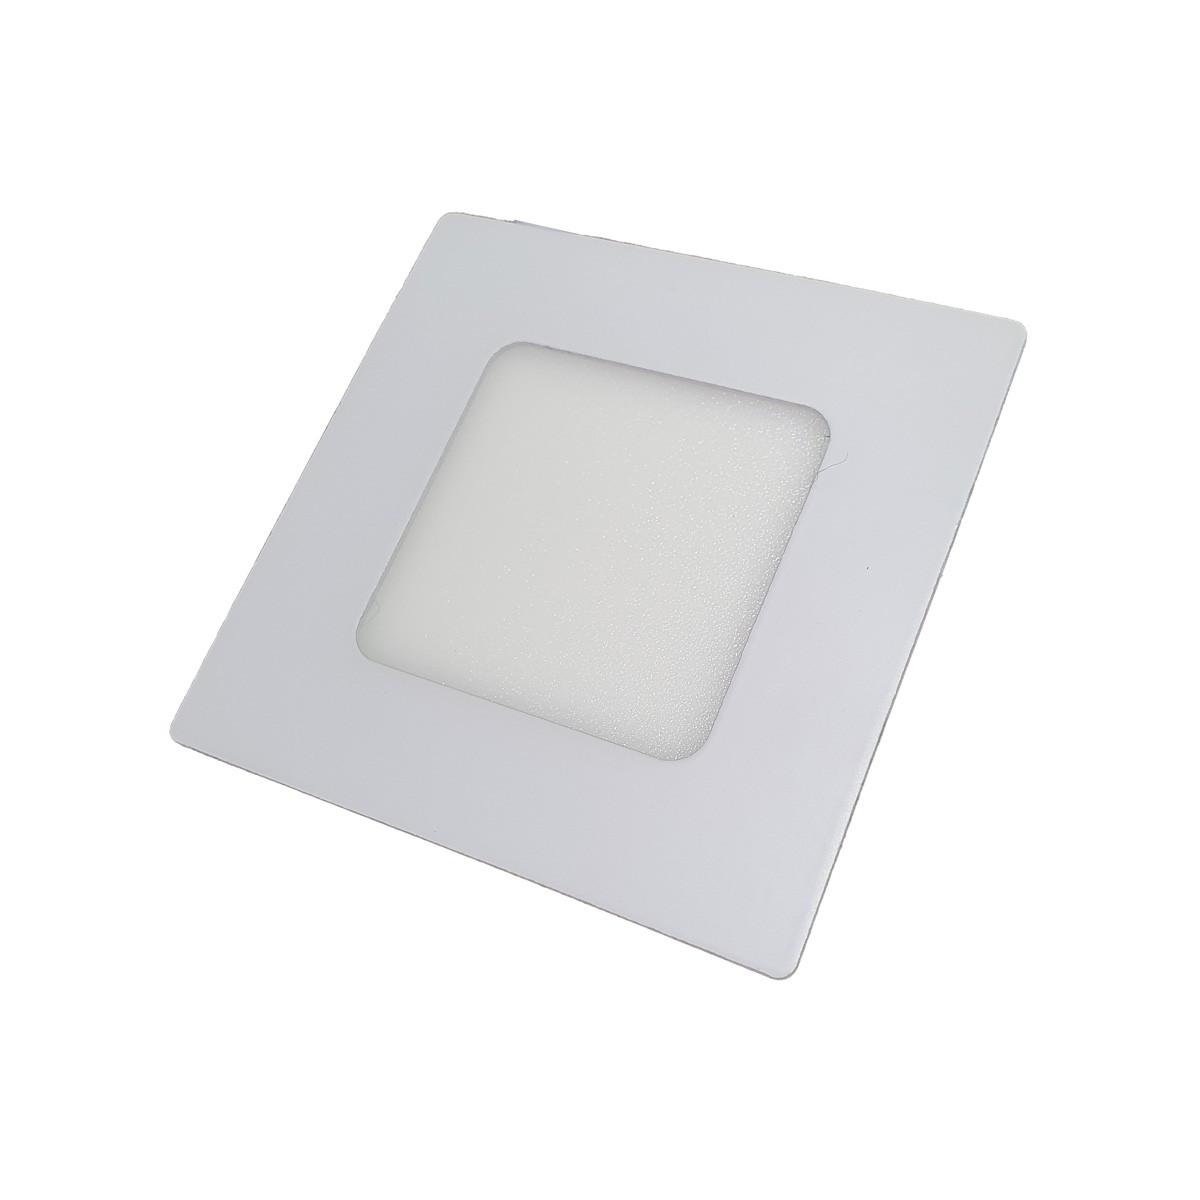 Kit 4 luminaria 3W LED embutir gesso Luz fria 6000k